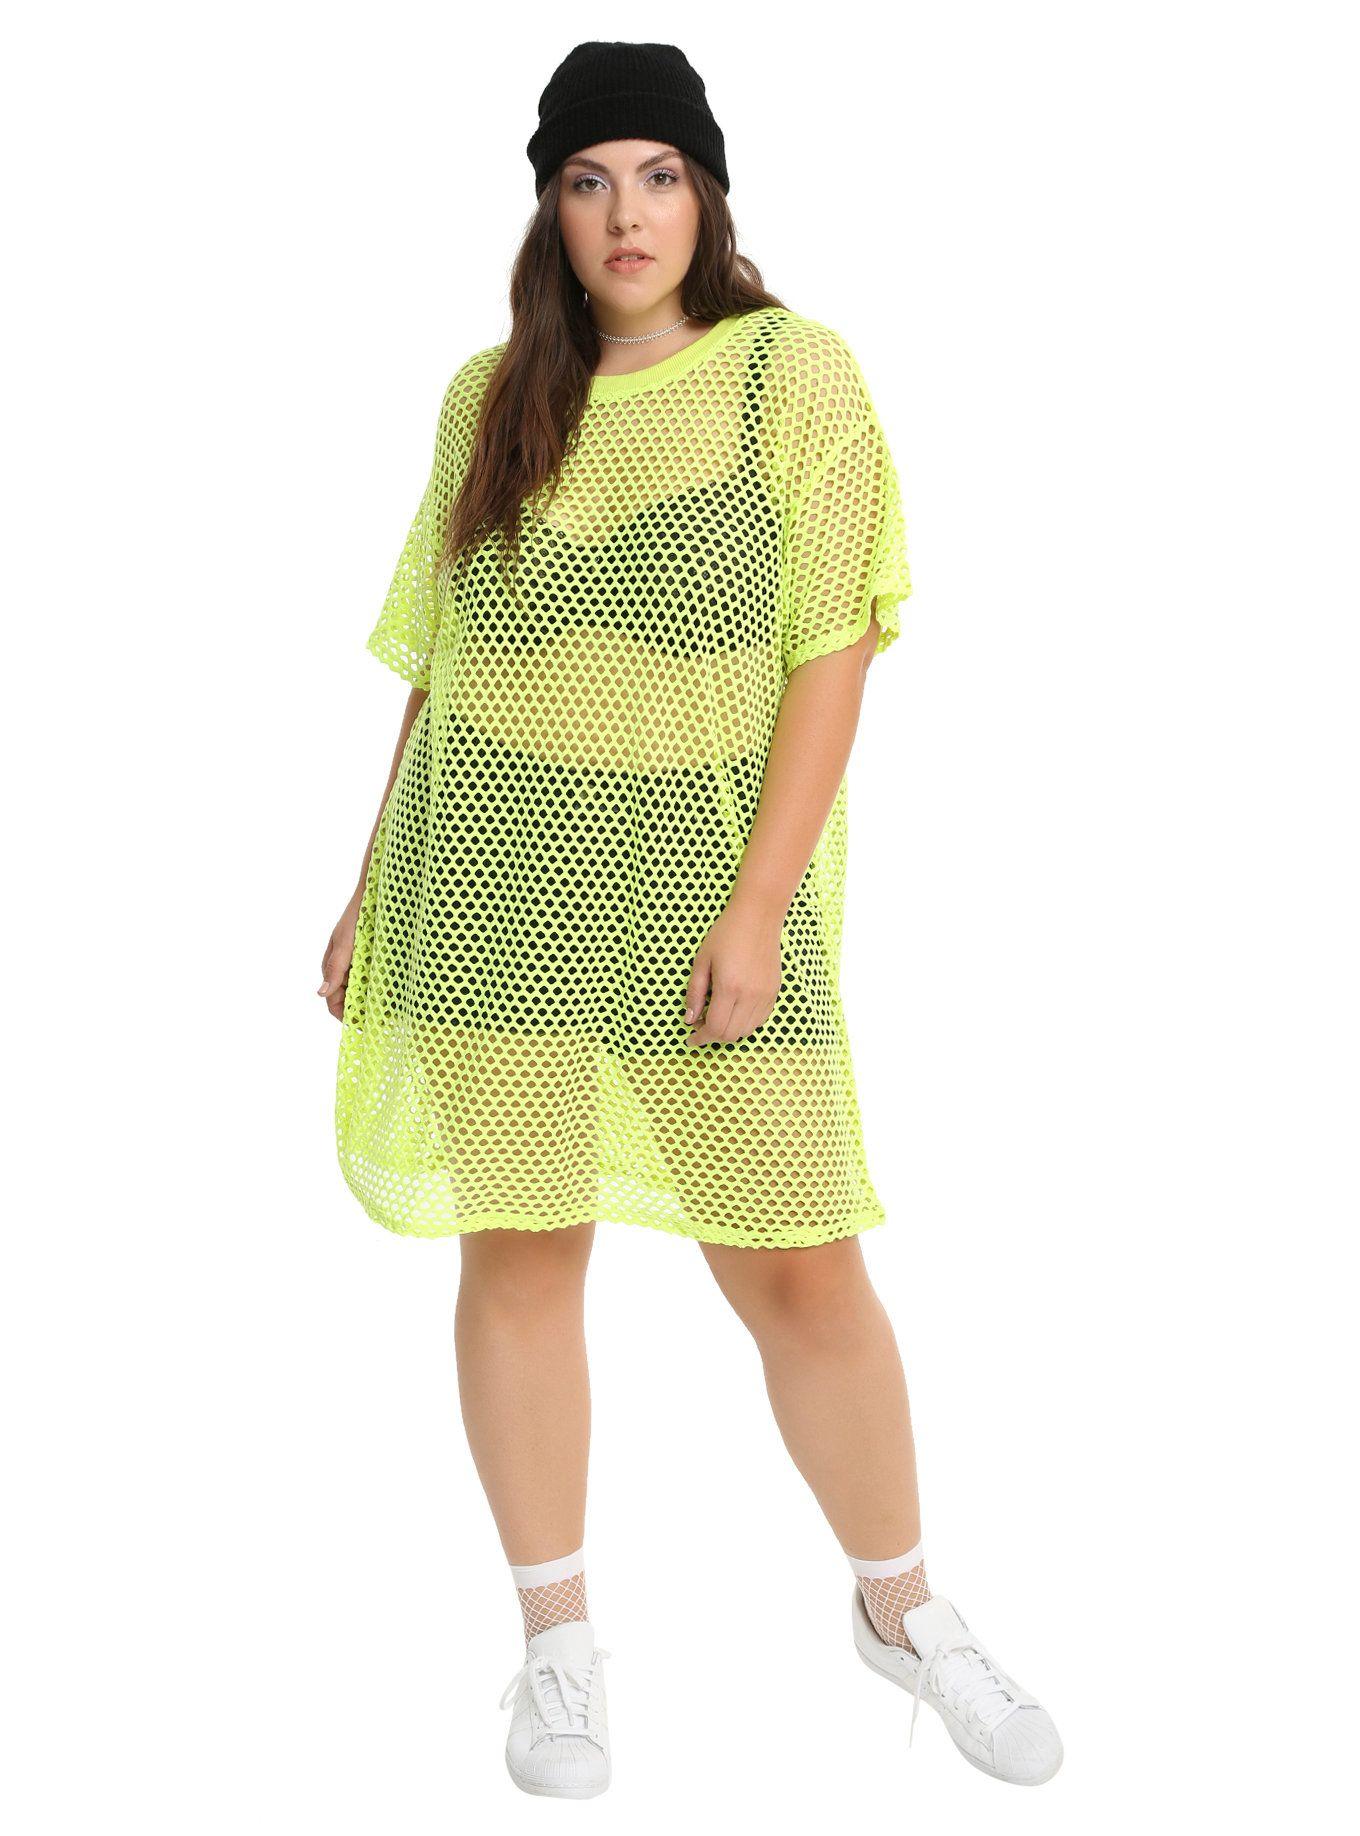 Neon Green Fishnet Dress Plus Size Fishnet Dress Neon Green And